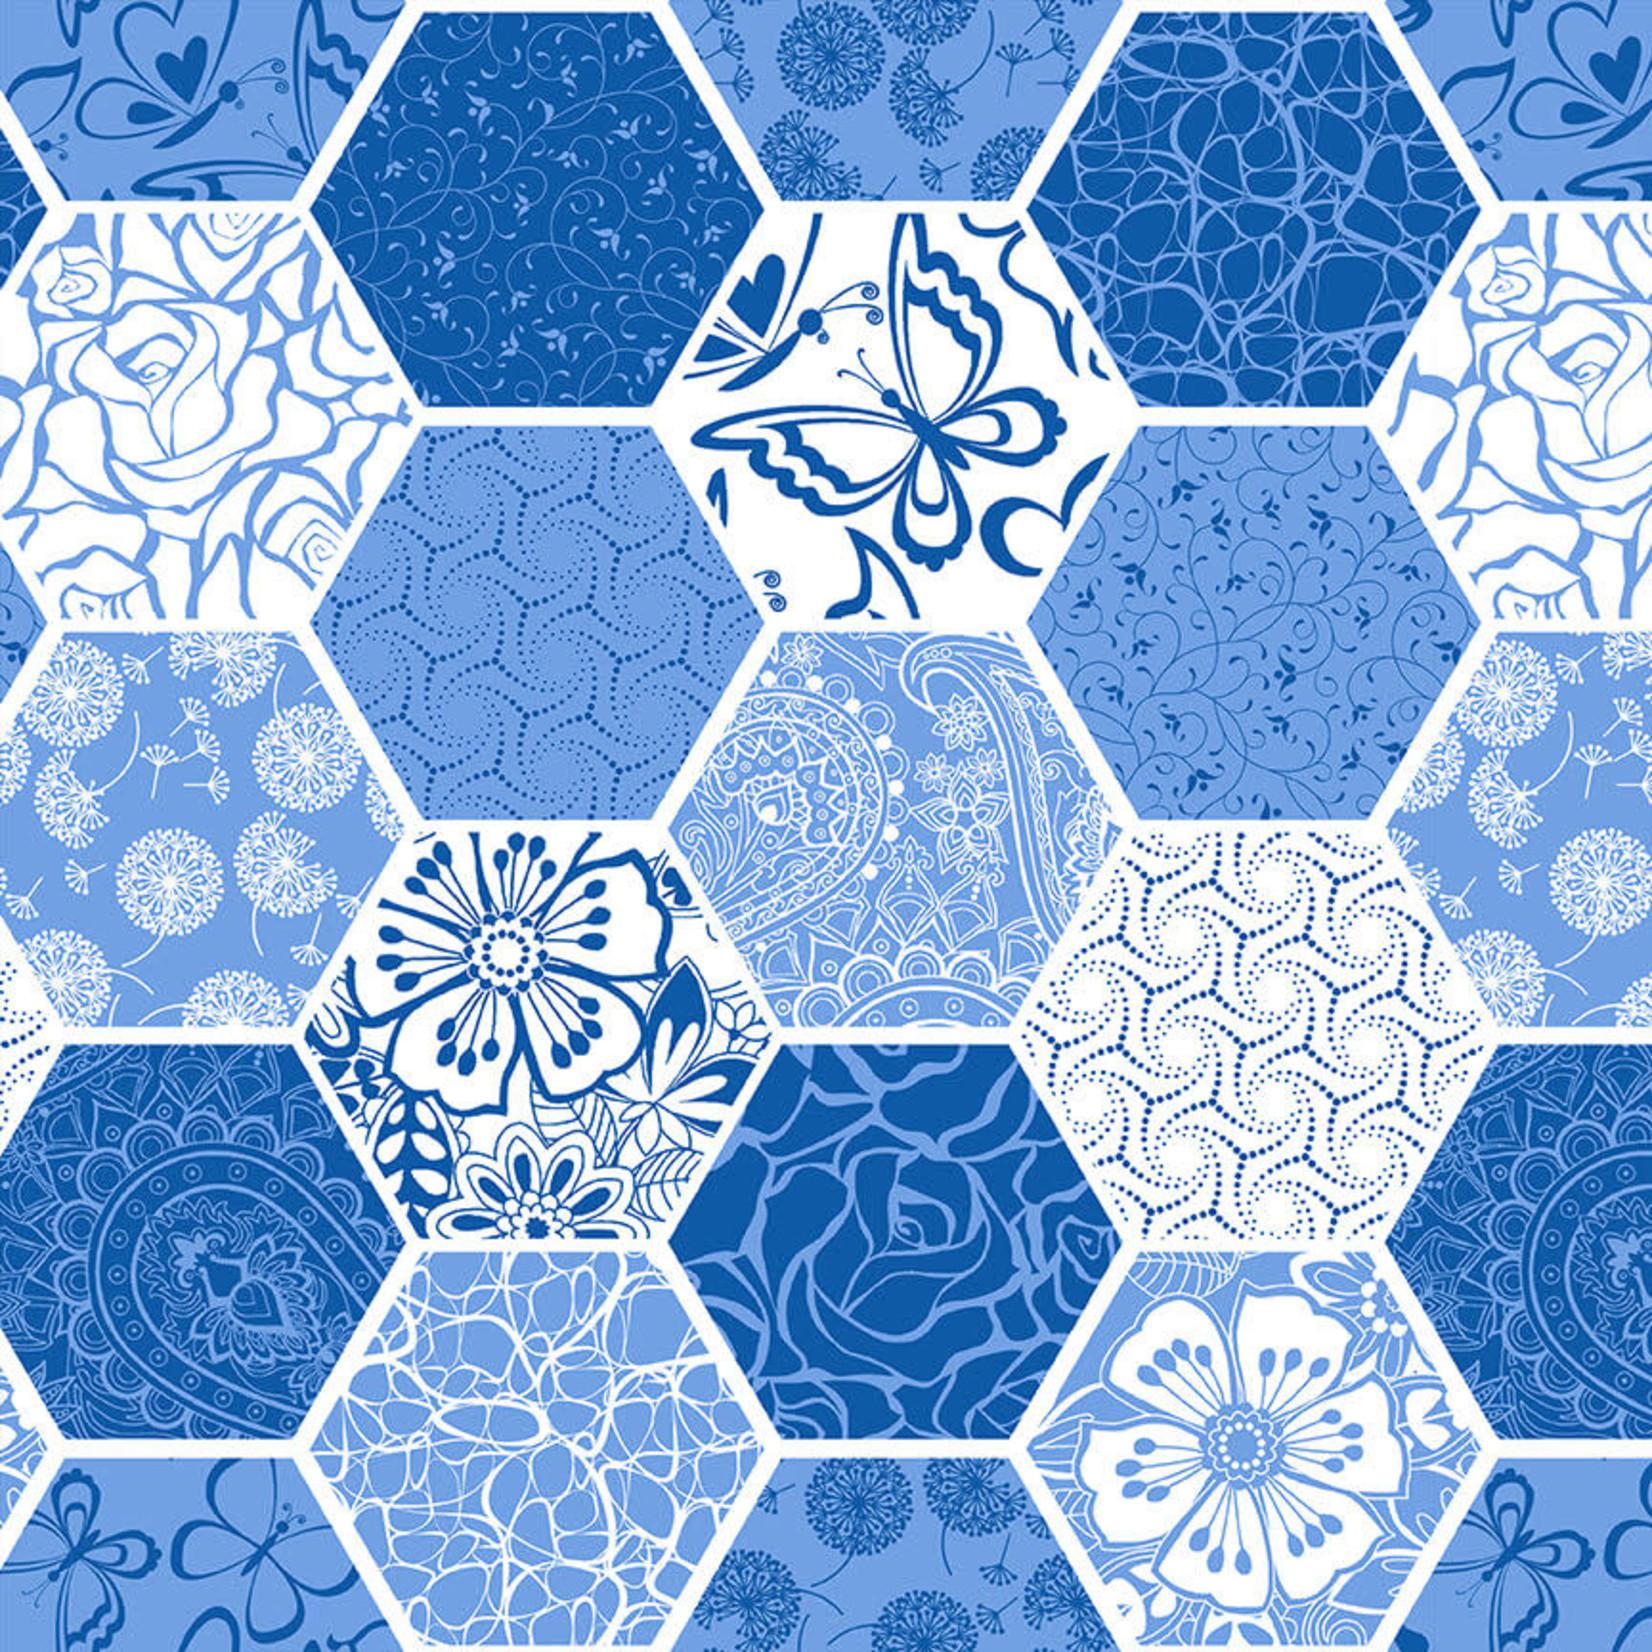 Blank Quilting Corp BLUE BAYOU, HEXIES, MEDIUM BLUE (1150-75) PER CM OR $19/M